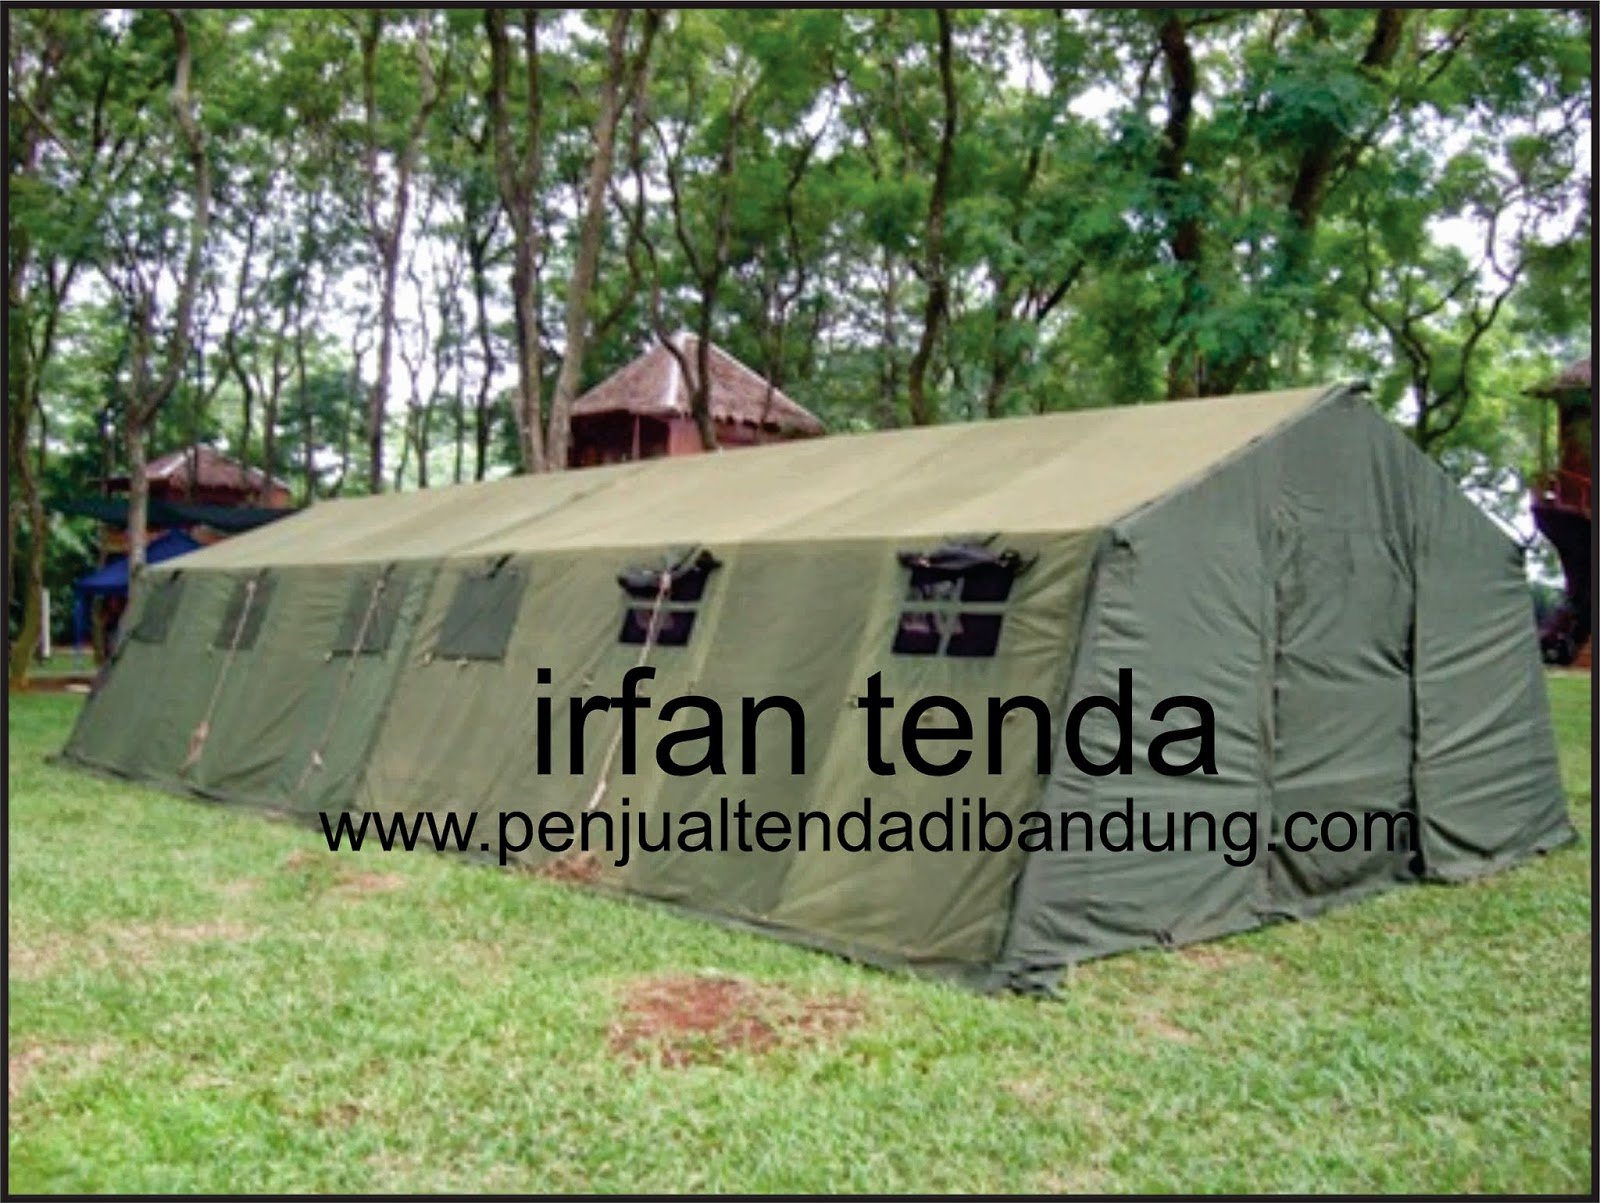 Penjual tenda di bandung, distributor tenda, penjual tenda, jual tenda dari harga murah hingga kualitas terbaik, serta menjual tenda pleton serbaguna dan menyediakan tenda pleton serbaguna.